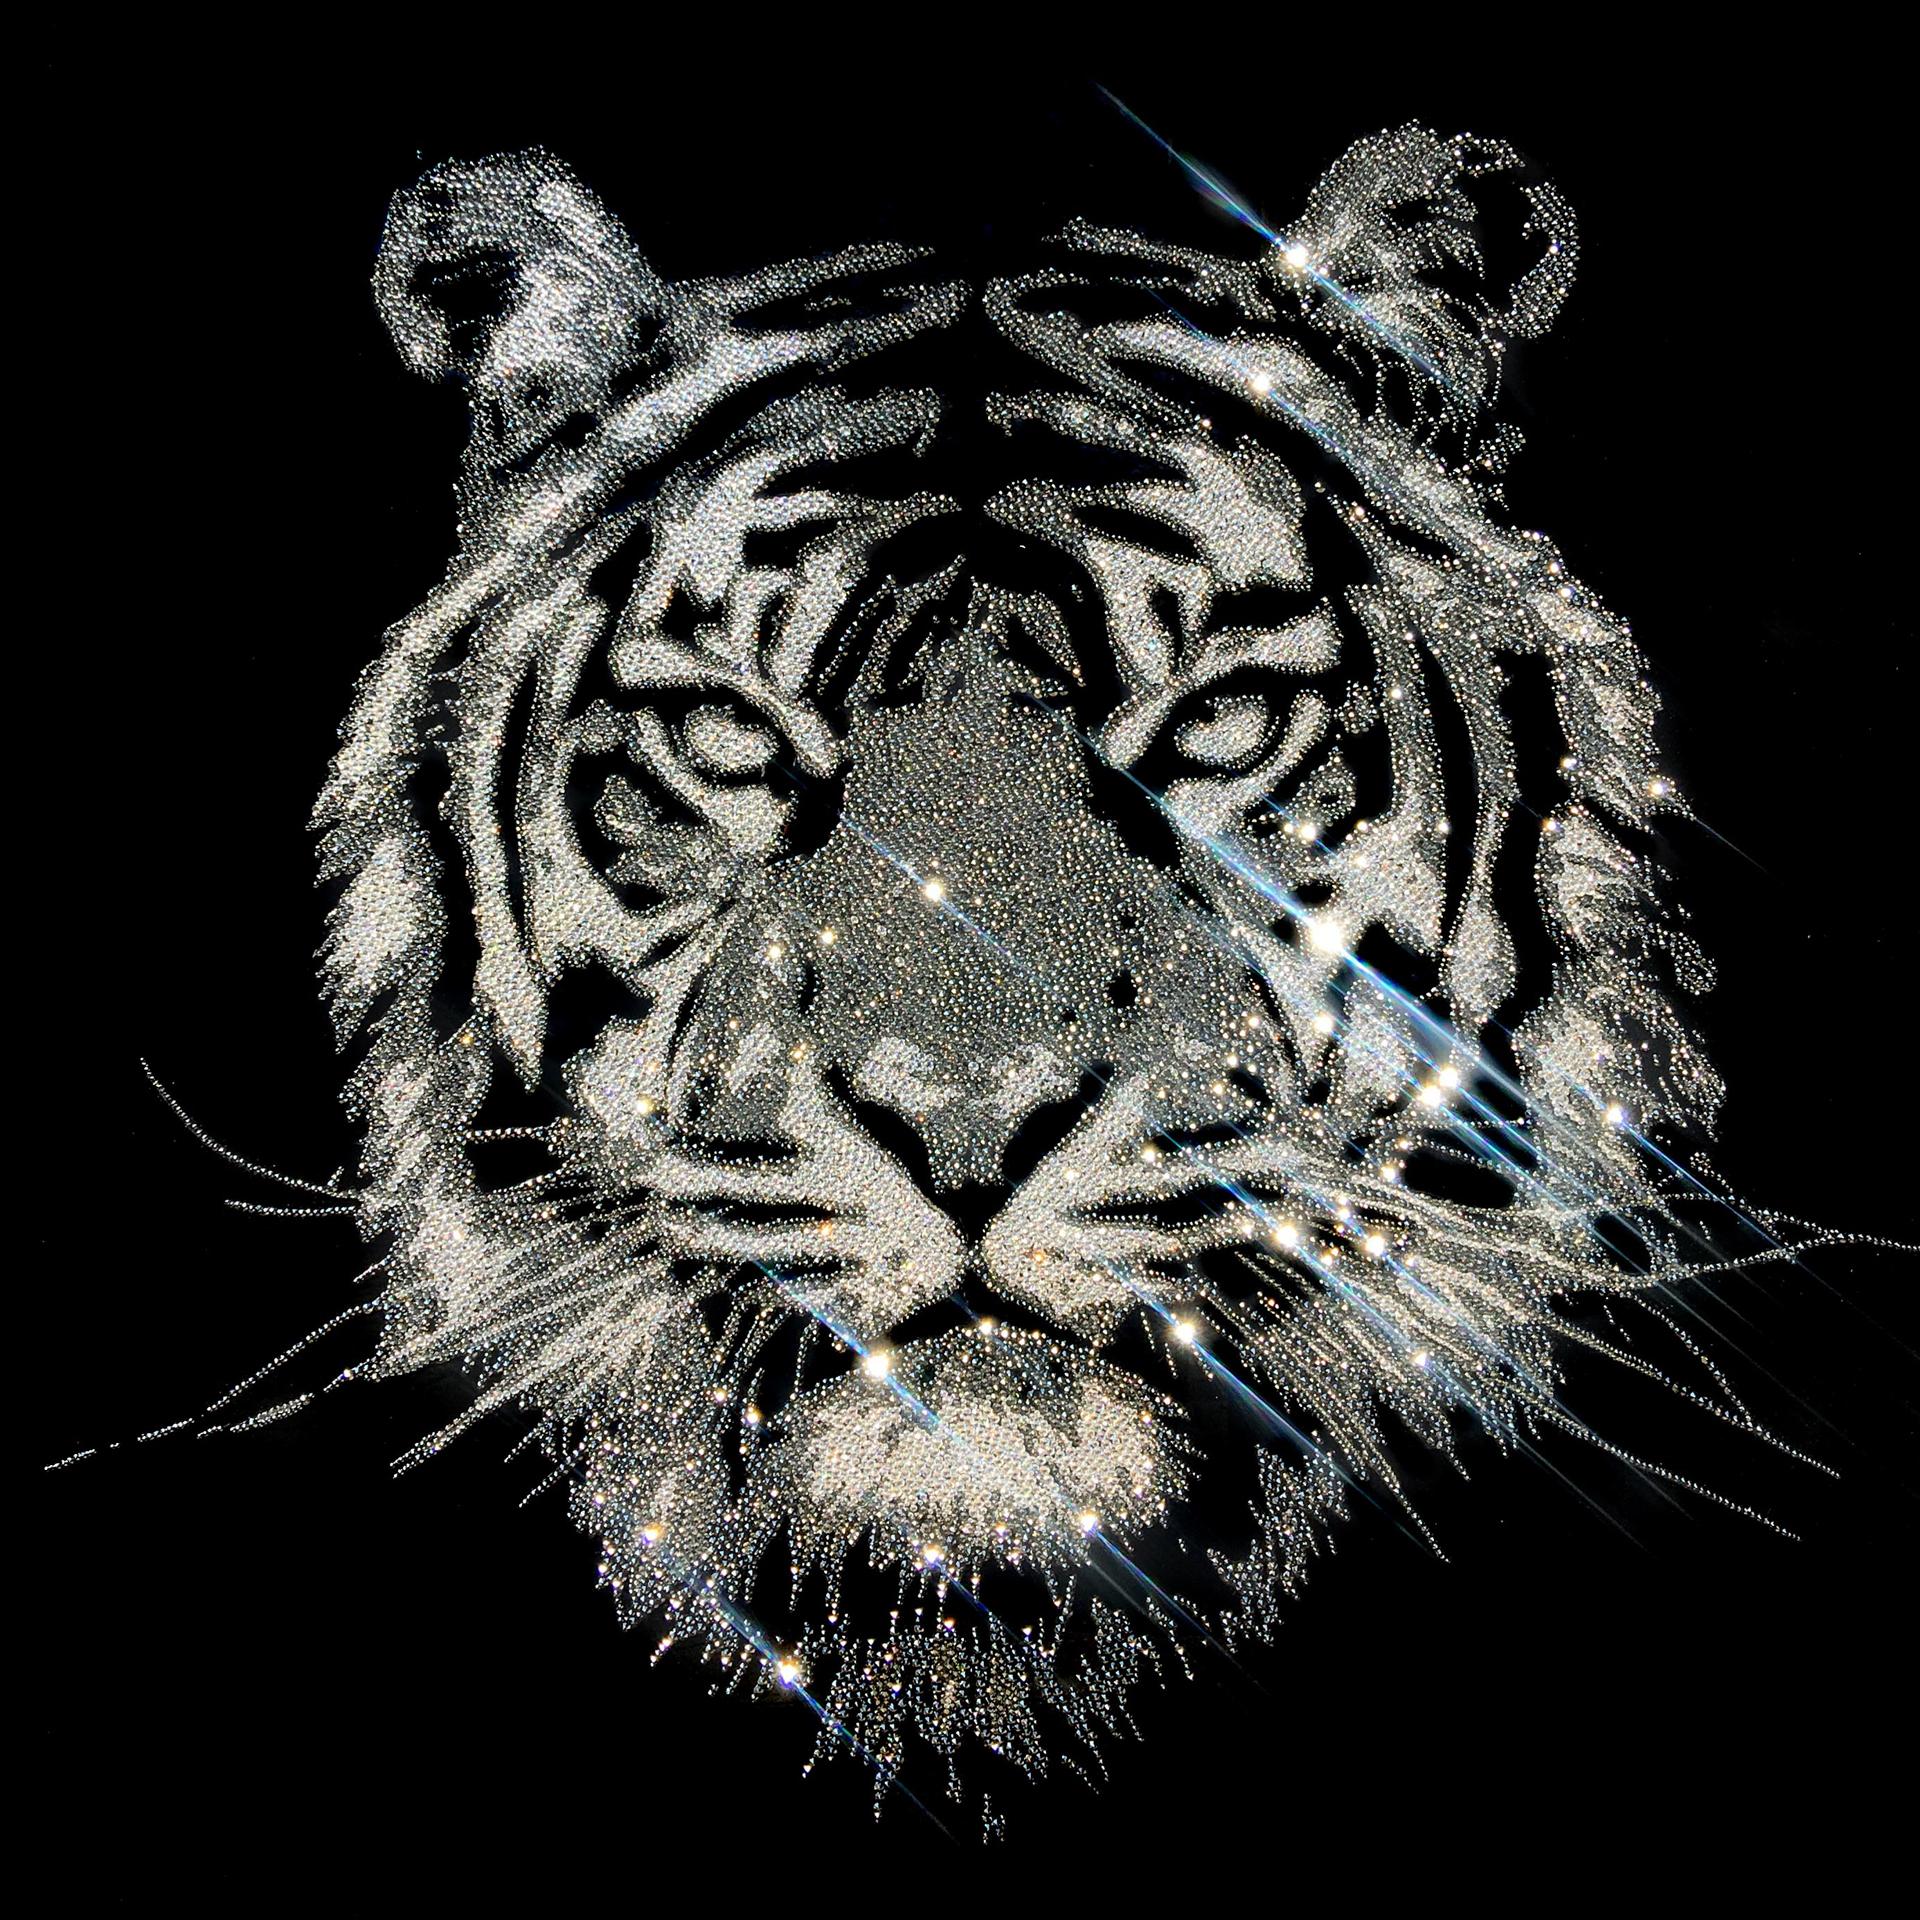 Severe Tiger, 29800 Crystals from Swarovski®, plexiglas, 80x80 cm. 2018